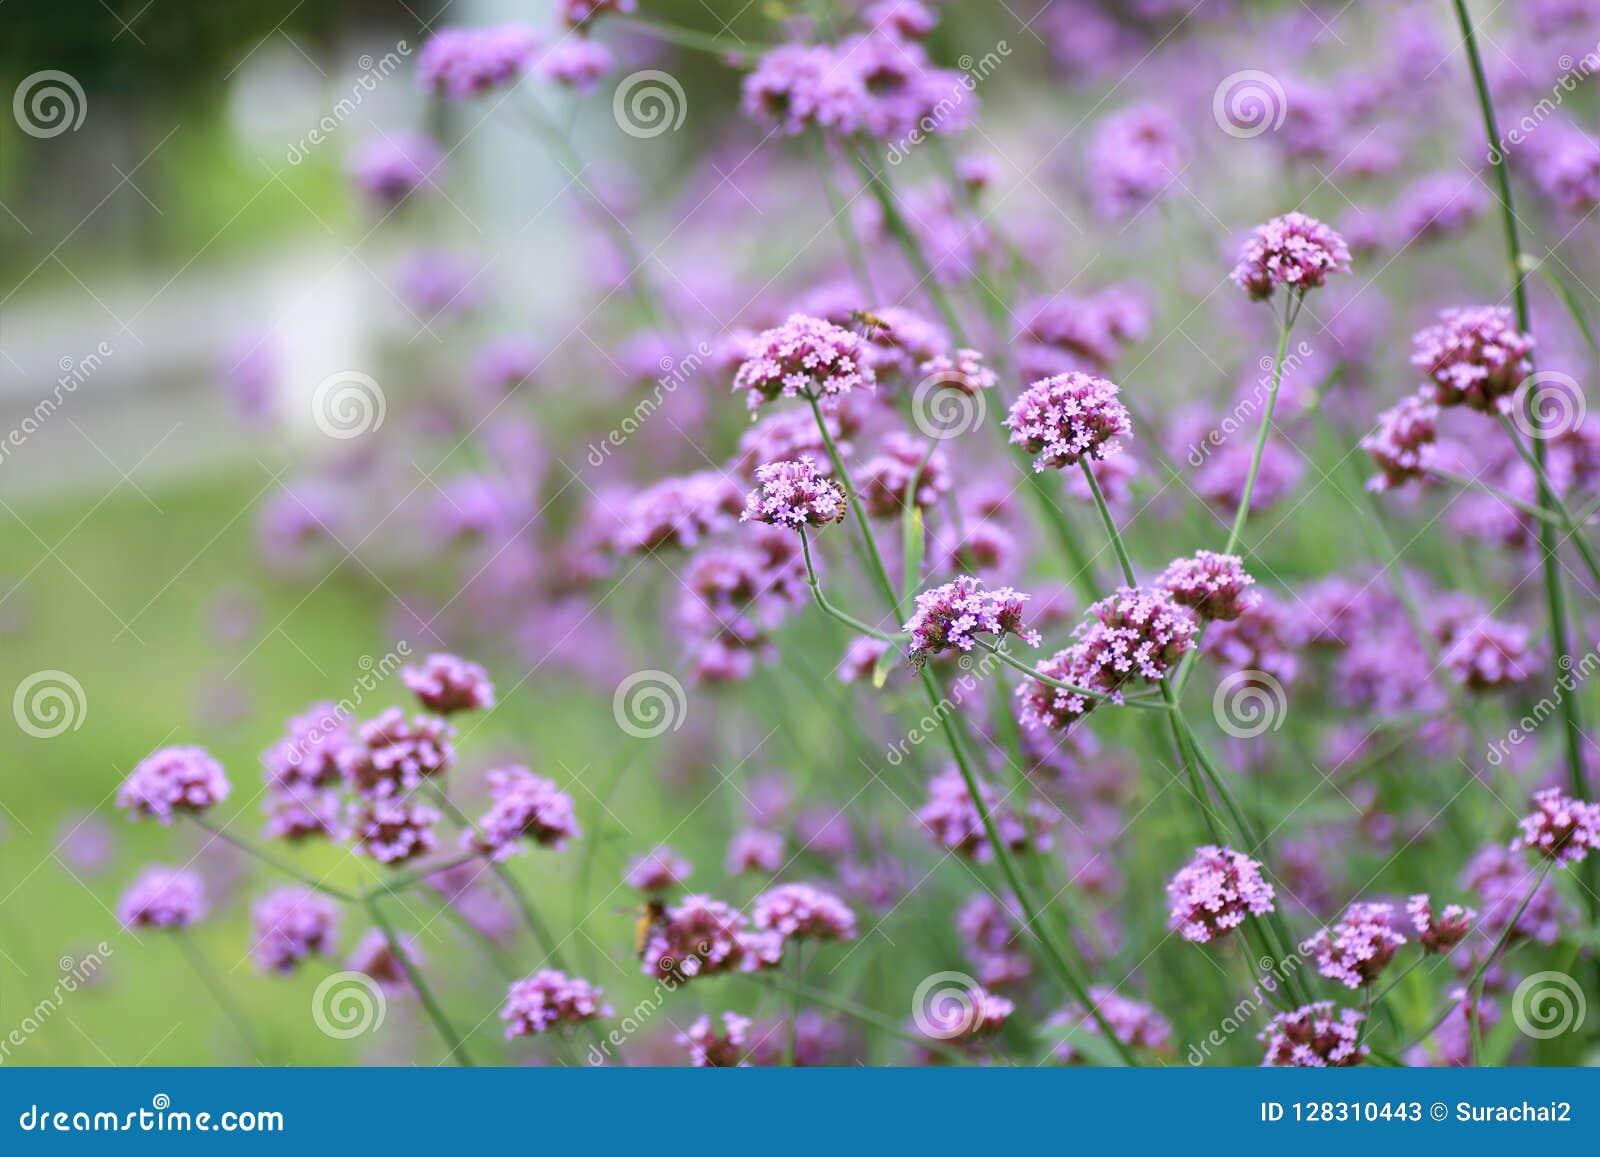 Красивый зацветая пурпурный цветок вербены в саде